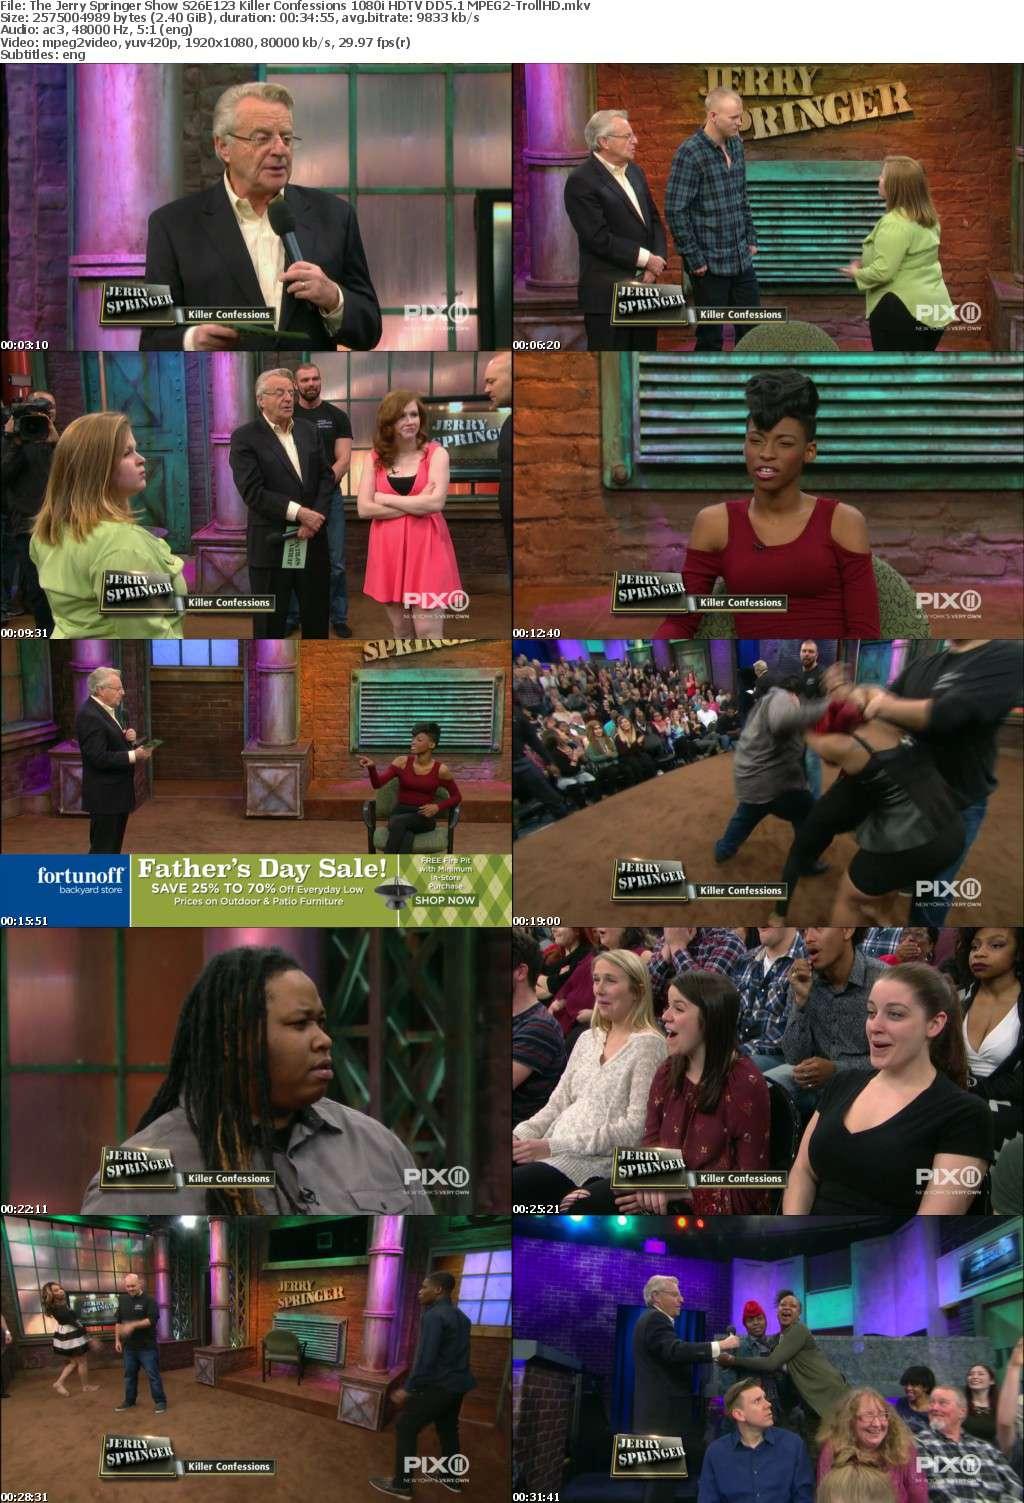 The Jerry Springer Show S26E123 Killer Confessions 1080i HDTV DD5 1 MPEG2-TrollHD - MPEG2